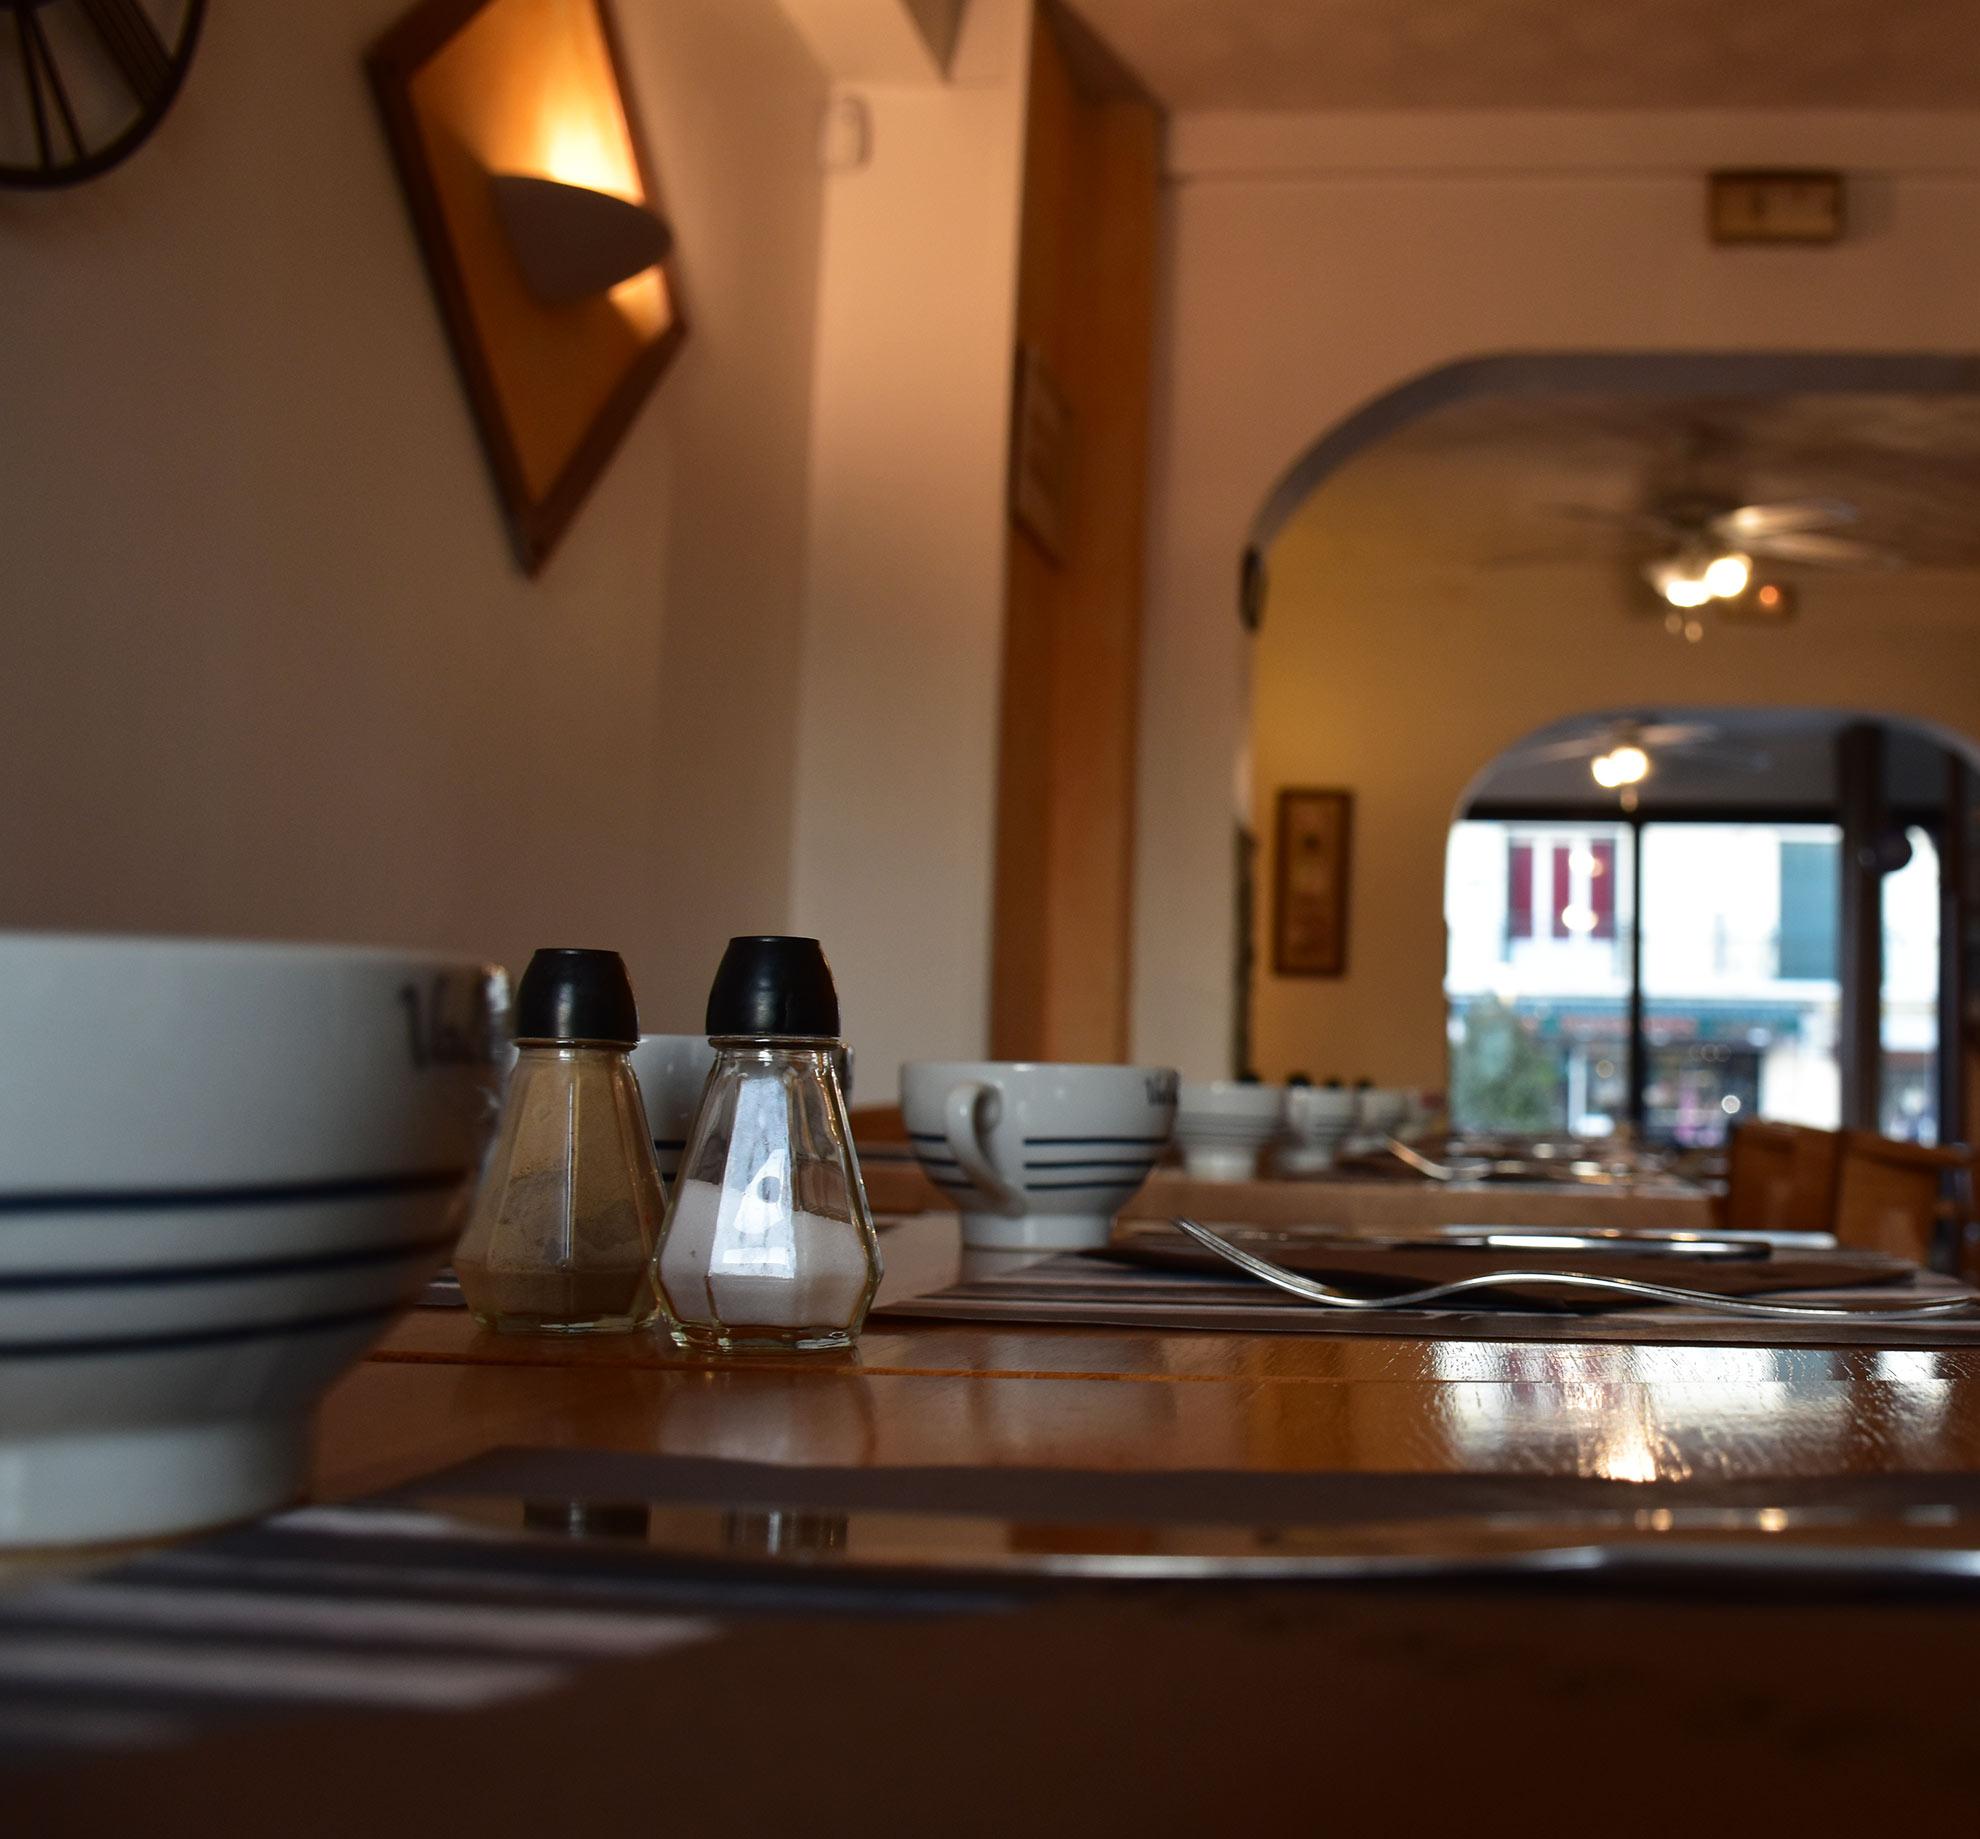 Restaurant crêperie-saladerie Crep'Show